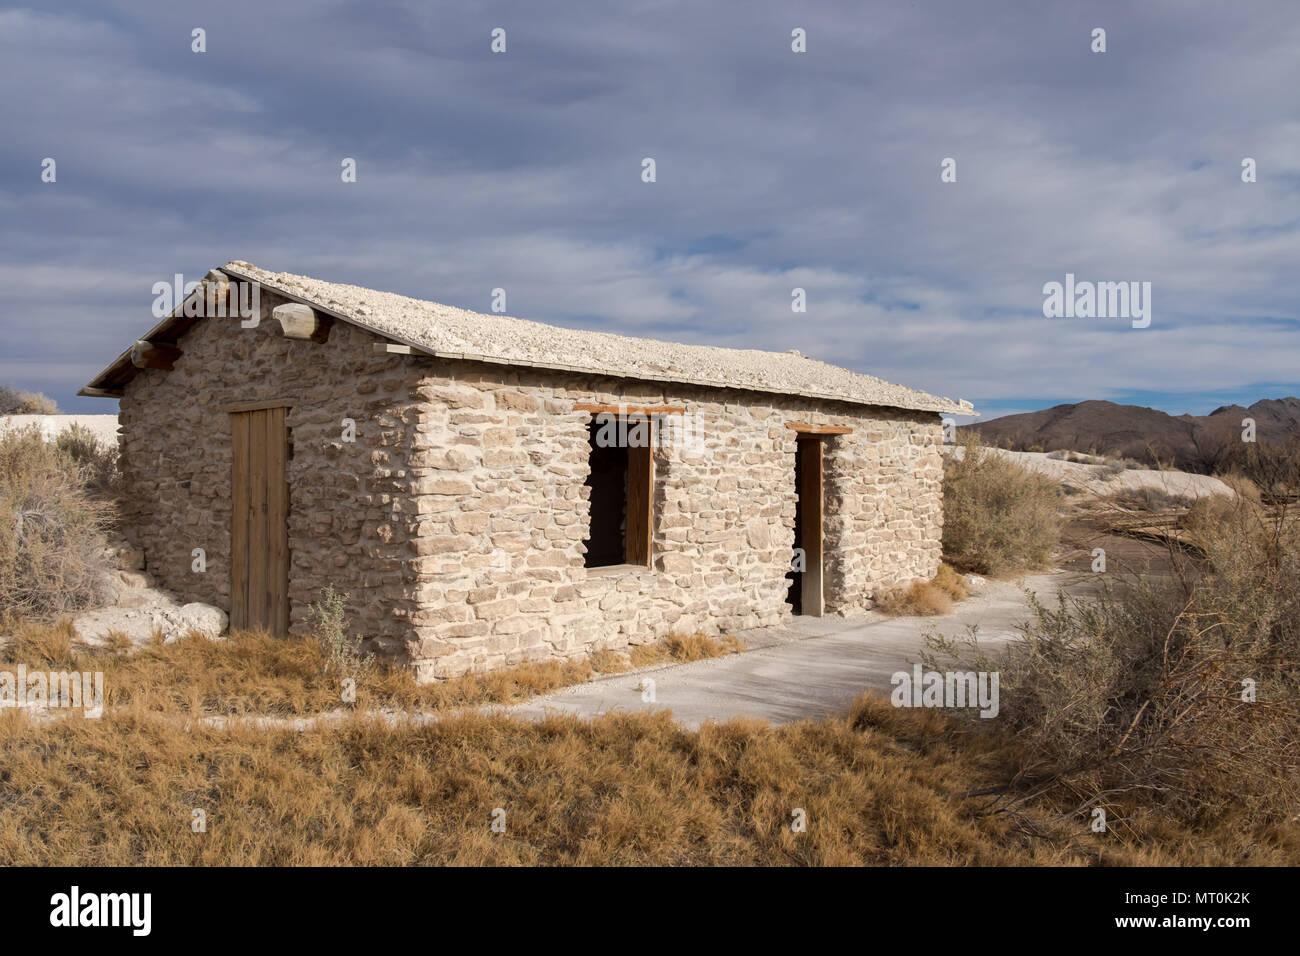 Jack's Stone Cabin in Ash Meadows National Wildlife Refuge, Nye County, Nevada, USA. Stock Photo